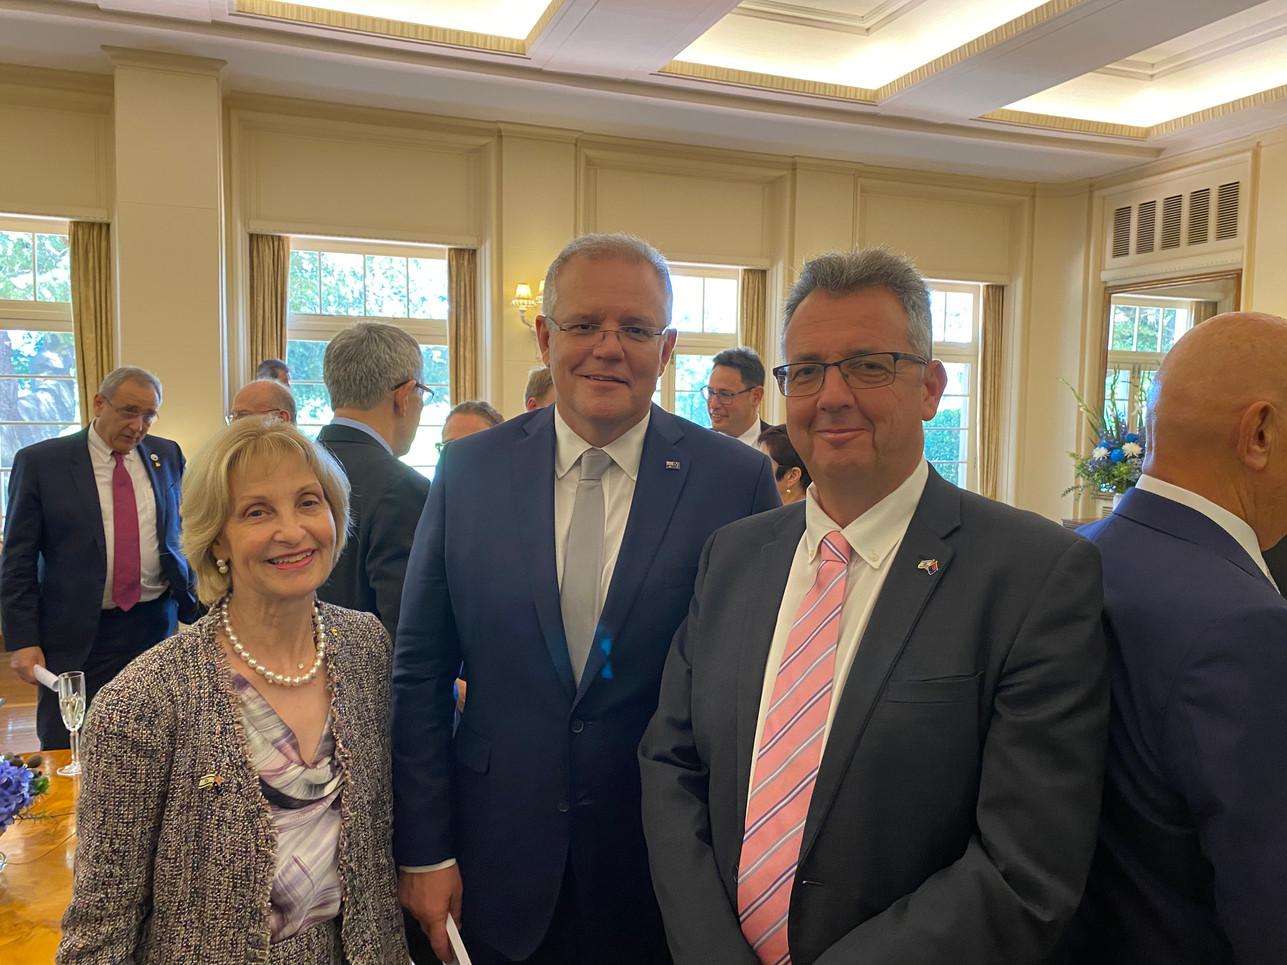 AICC (NSW) President- Jillian Segal AO, Australian Prime Minister The Hon Scott Morrison MP & IACC, ED- Paul Israel